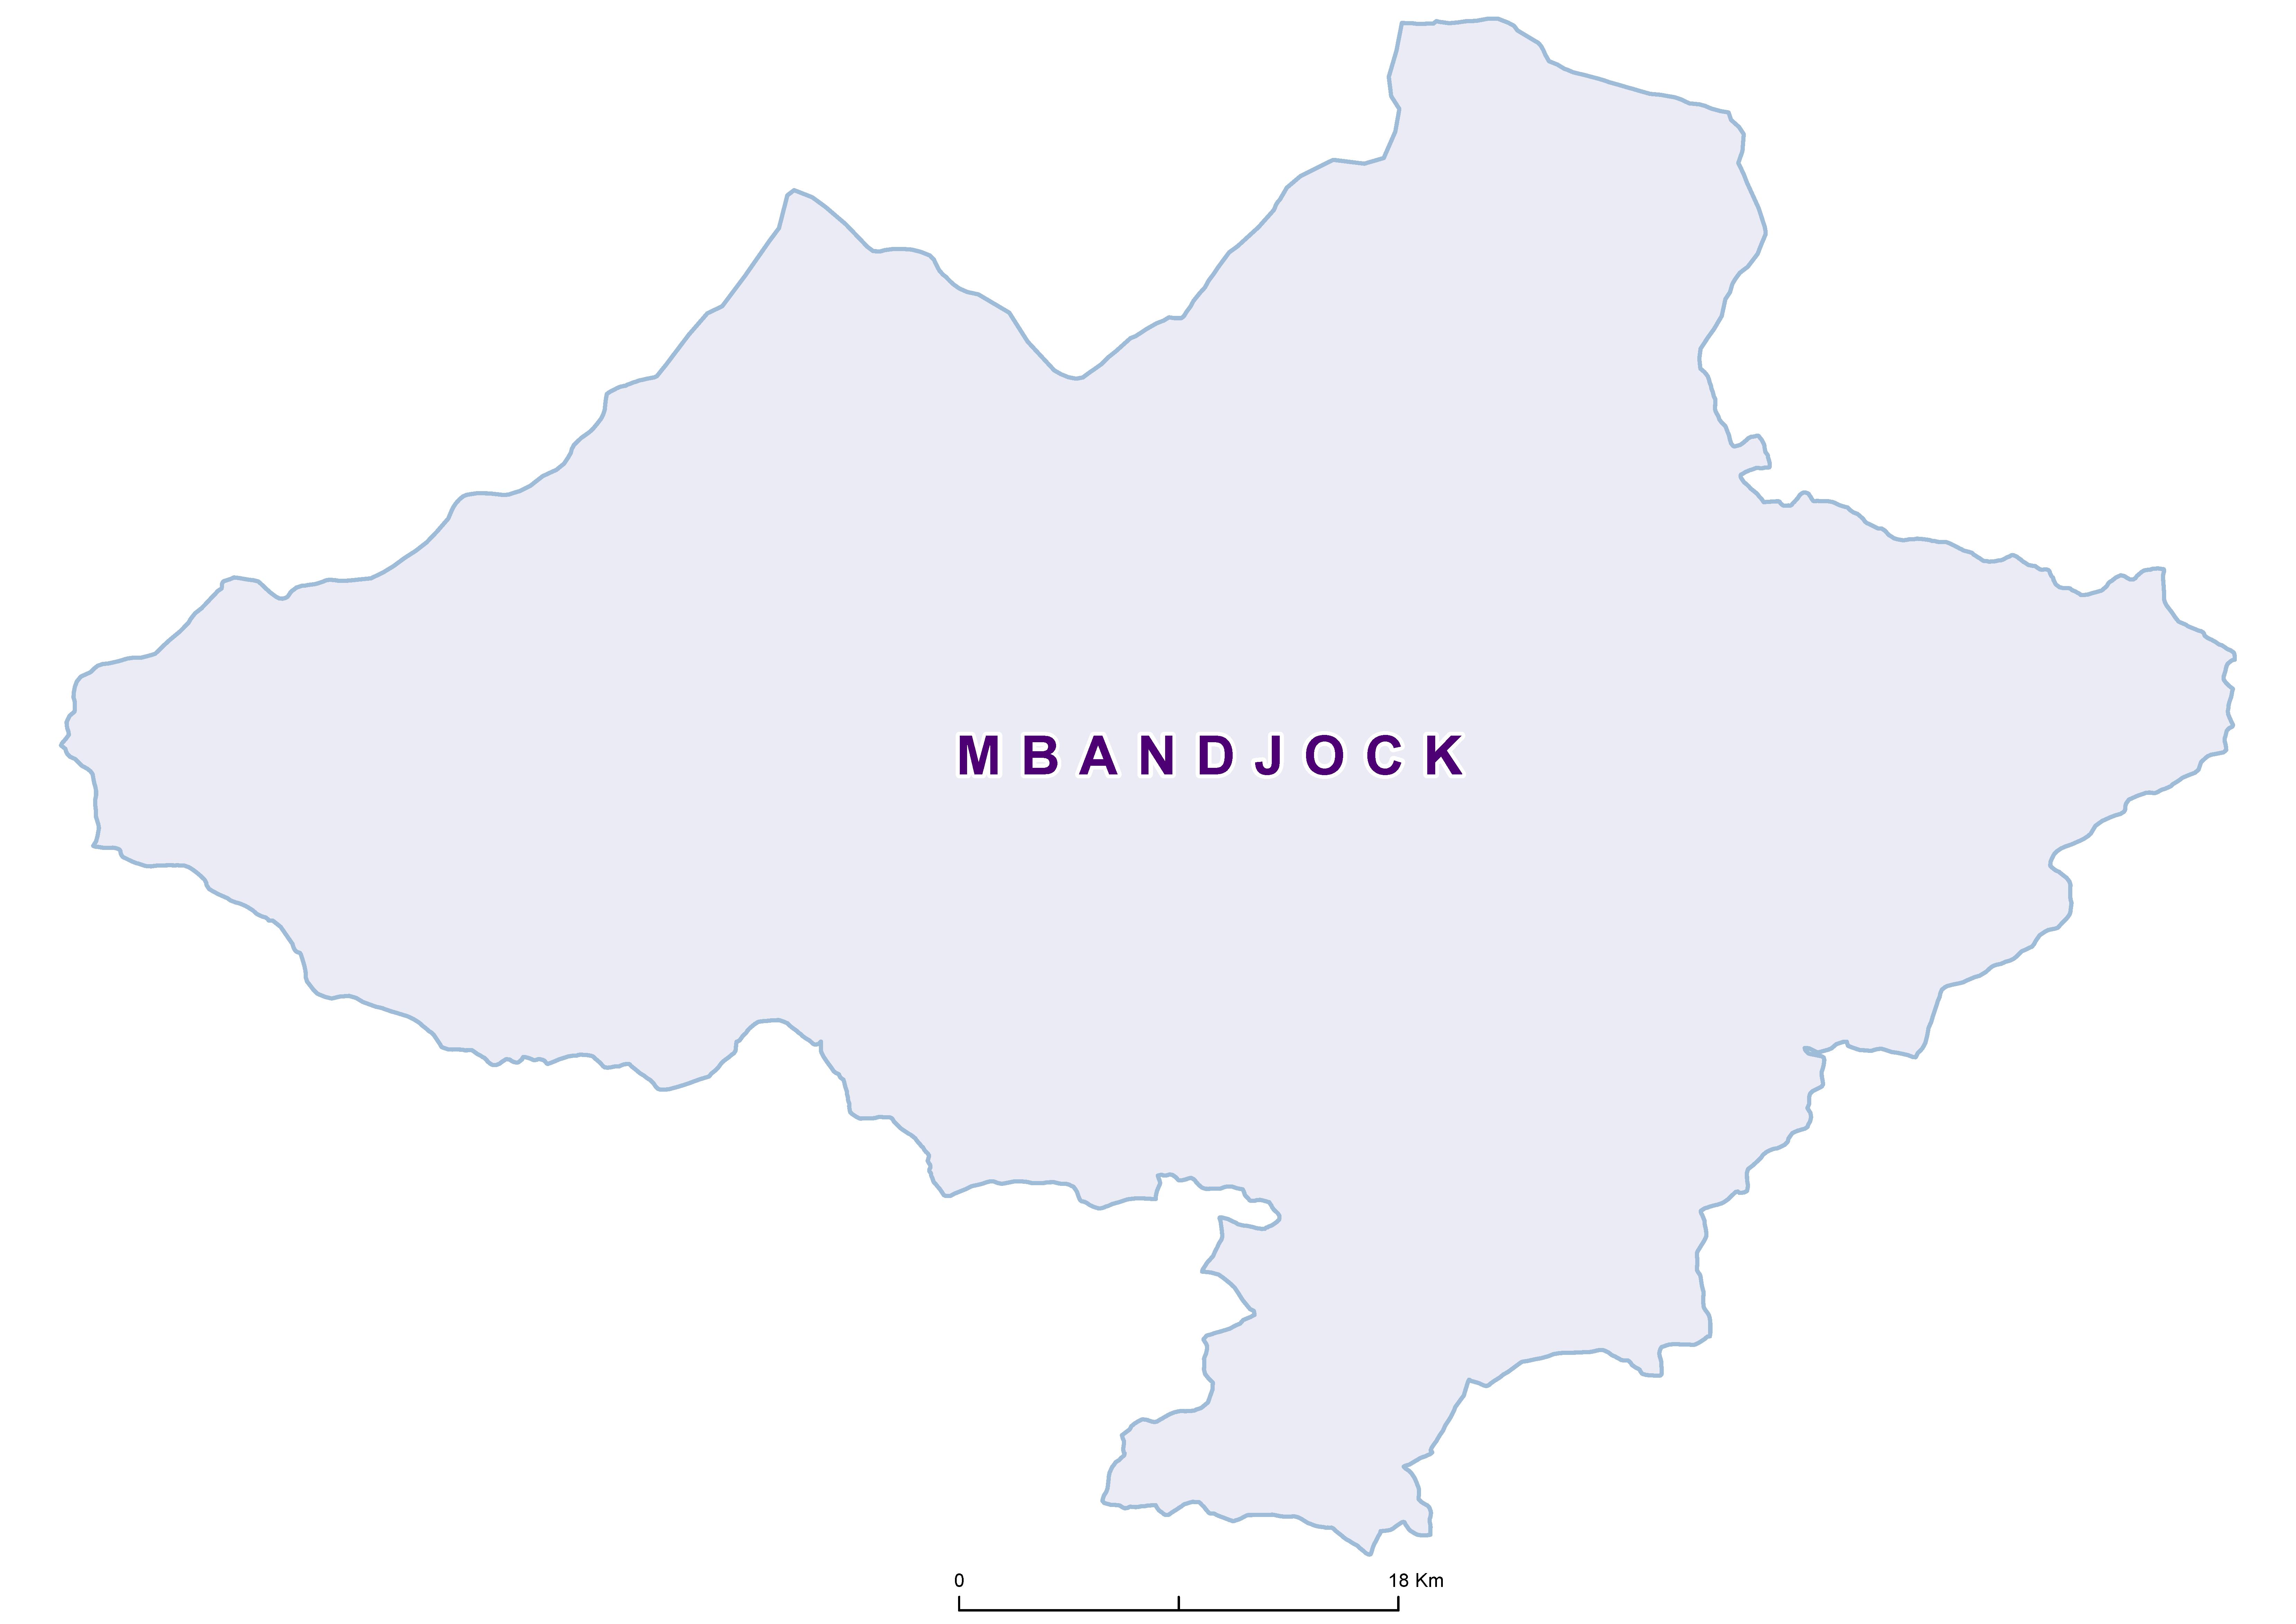 Mbandjock Mean SCH 20180001